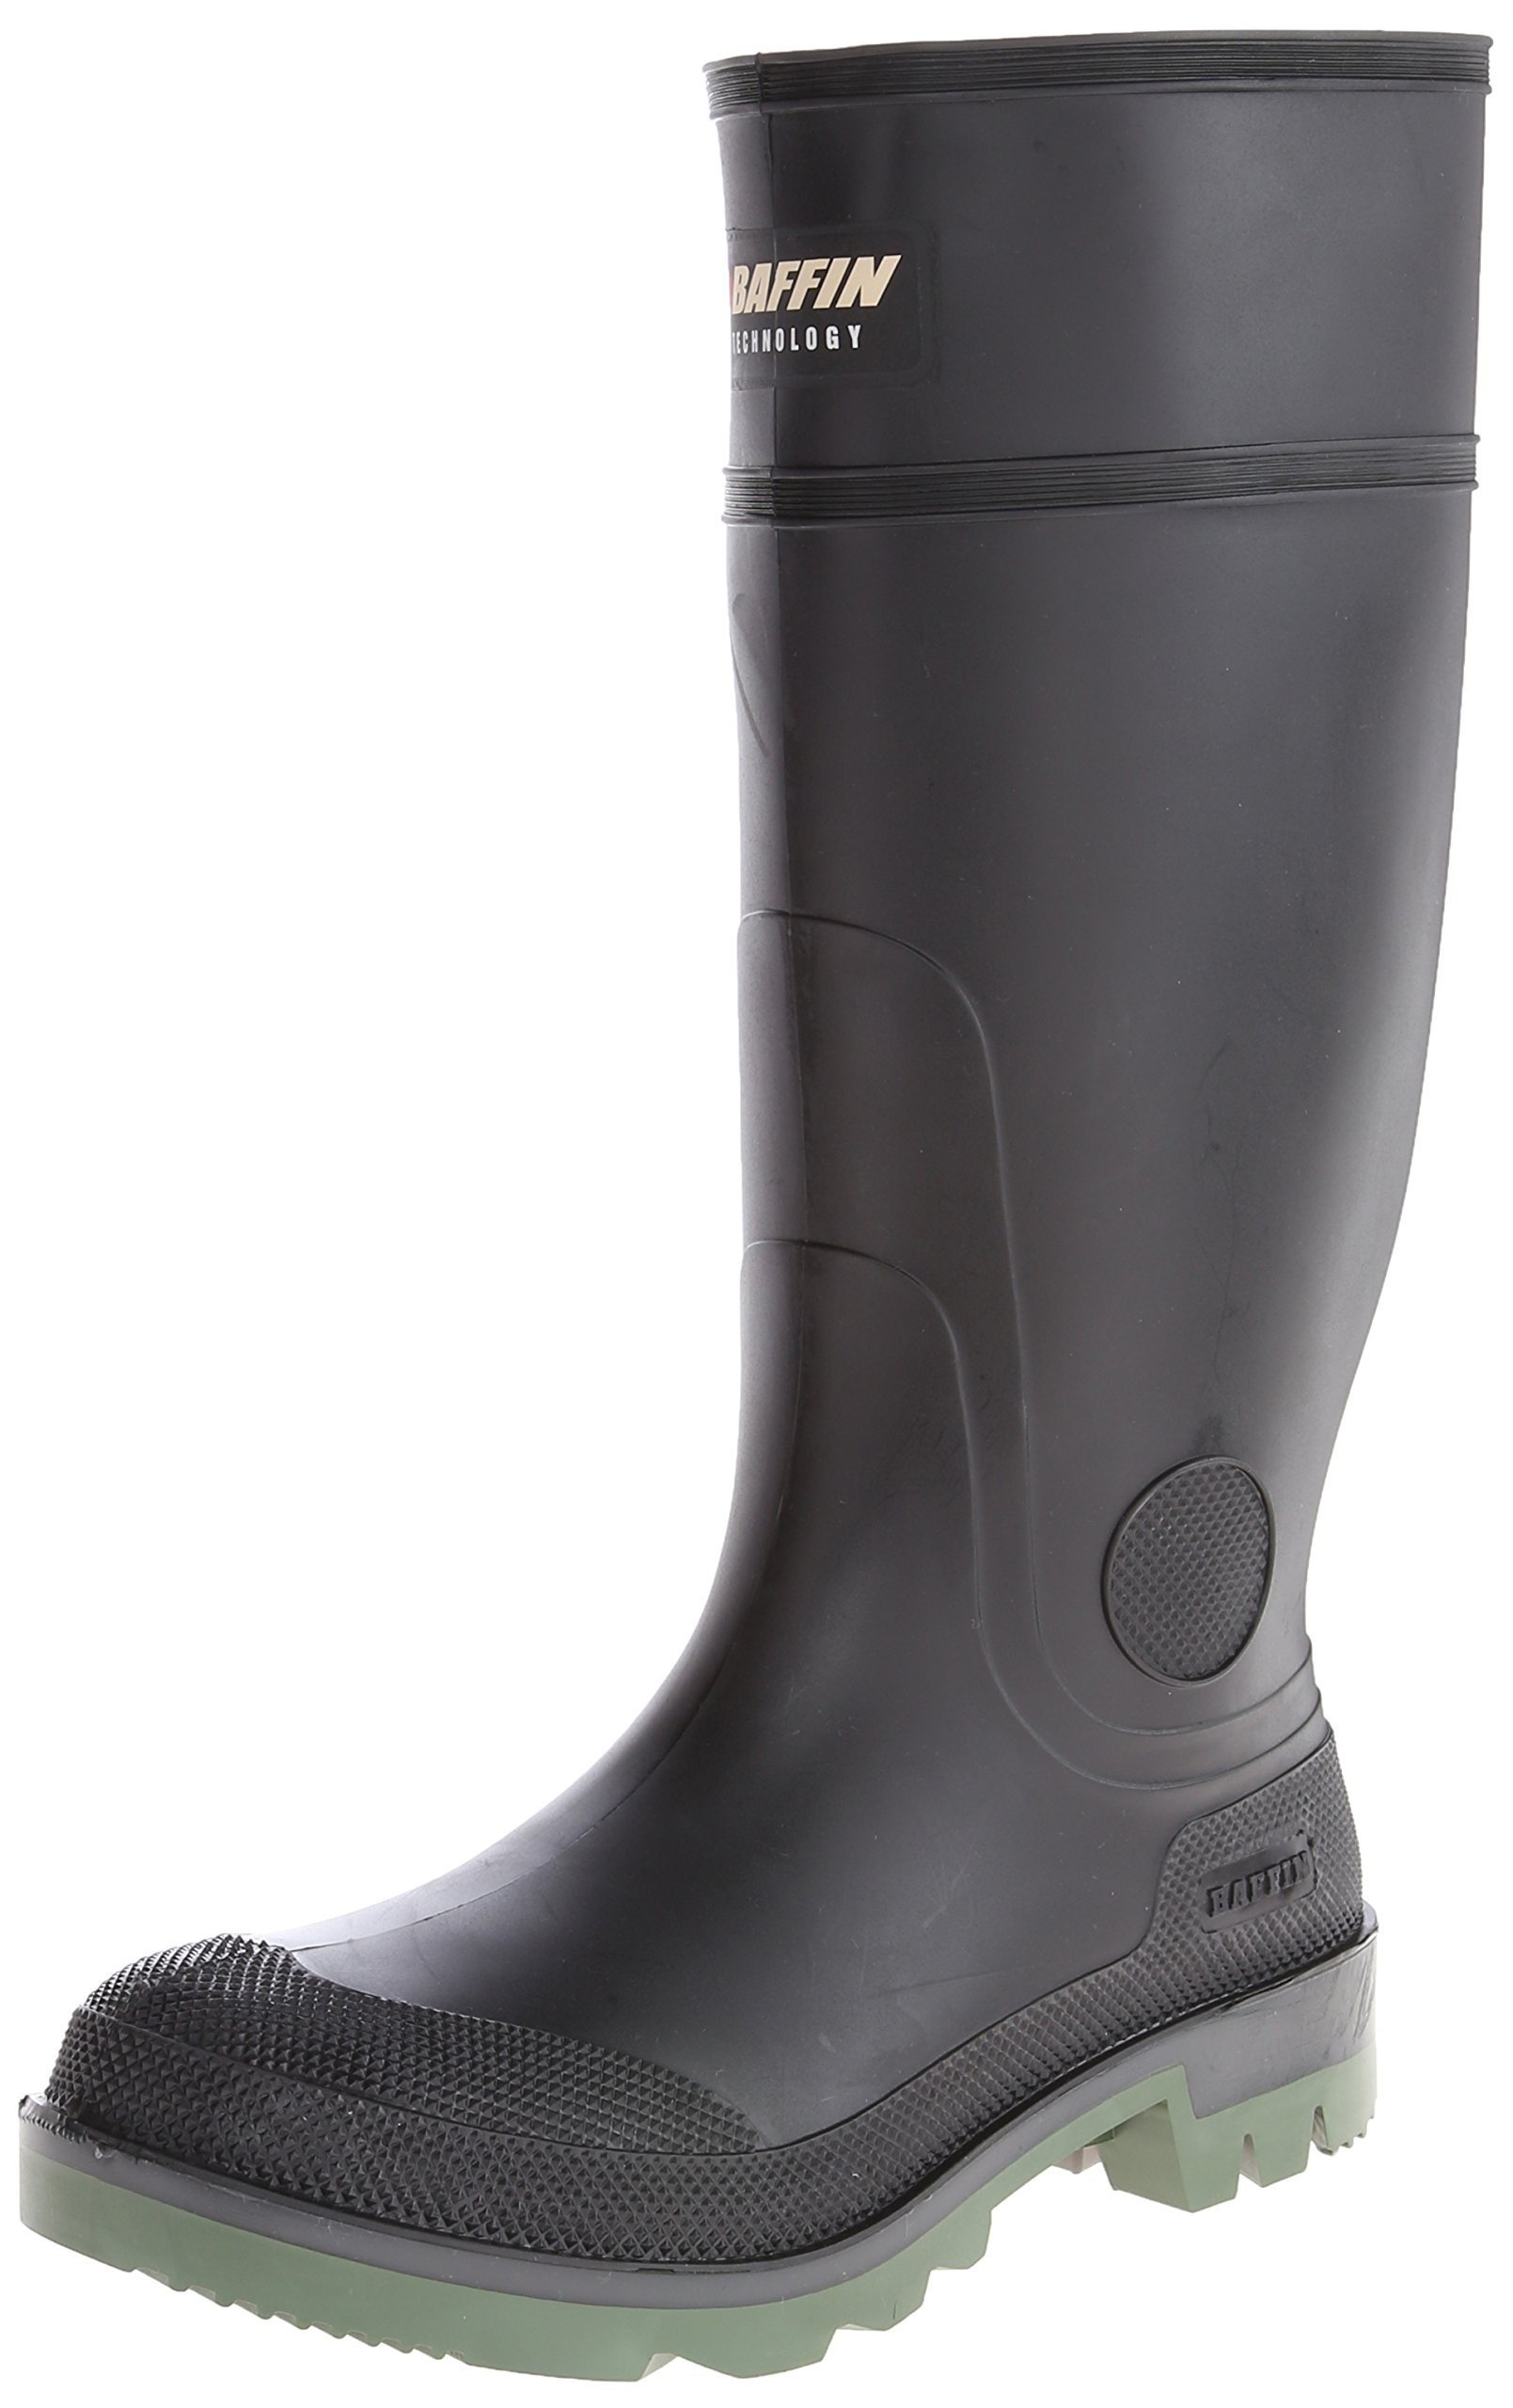 Baffin Men's Enduro PT Rain Boot,Black/Clear/Green,10 M US by Baffin